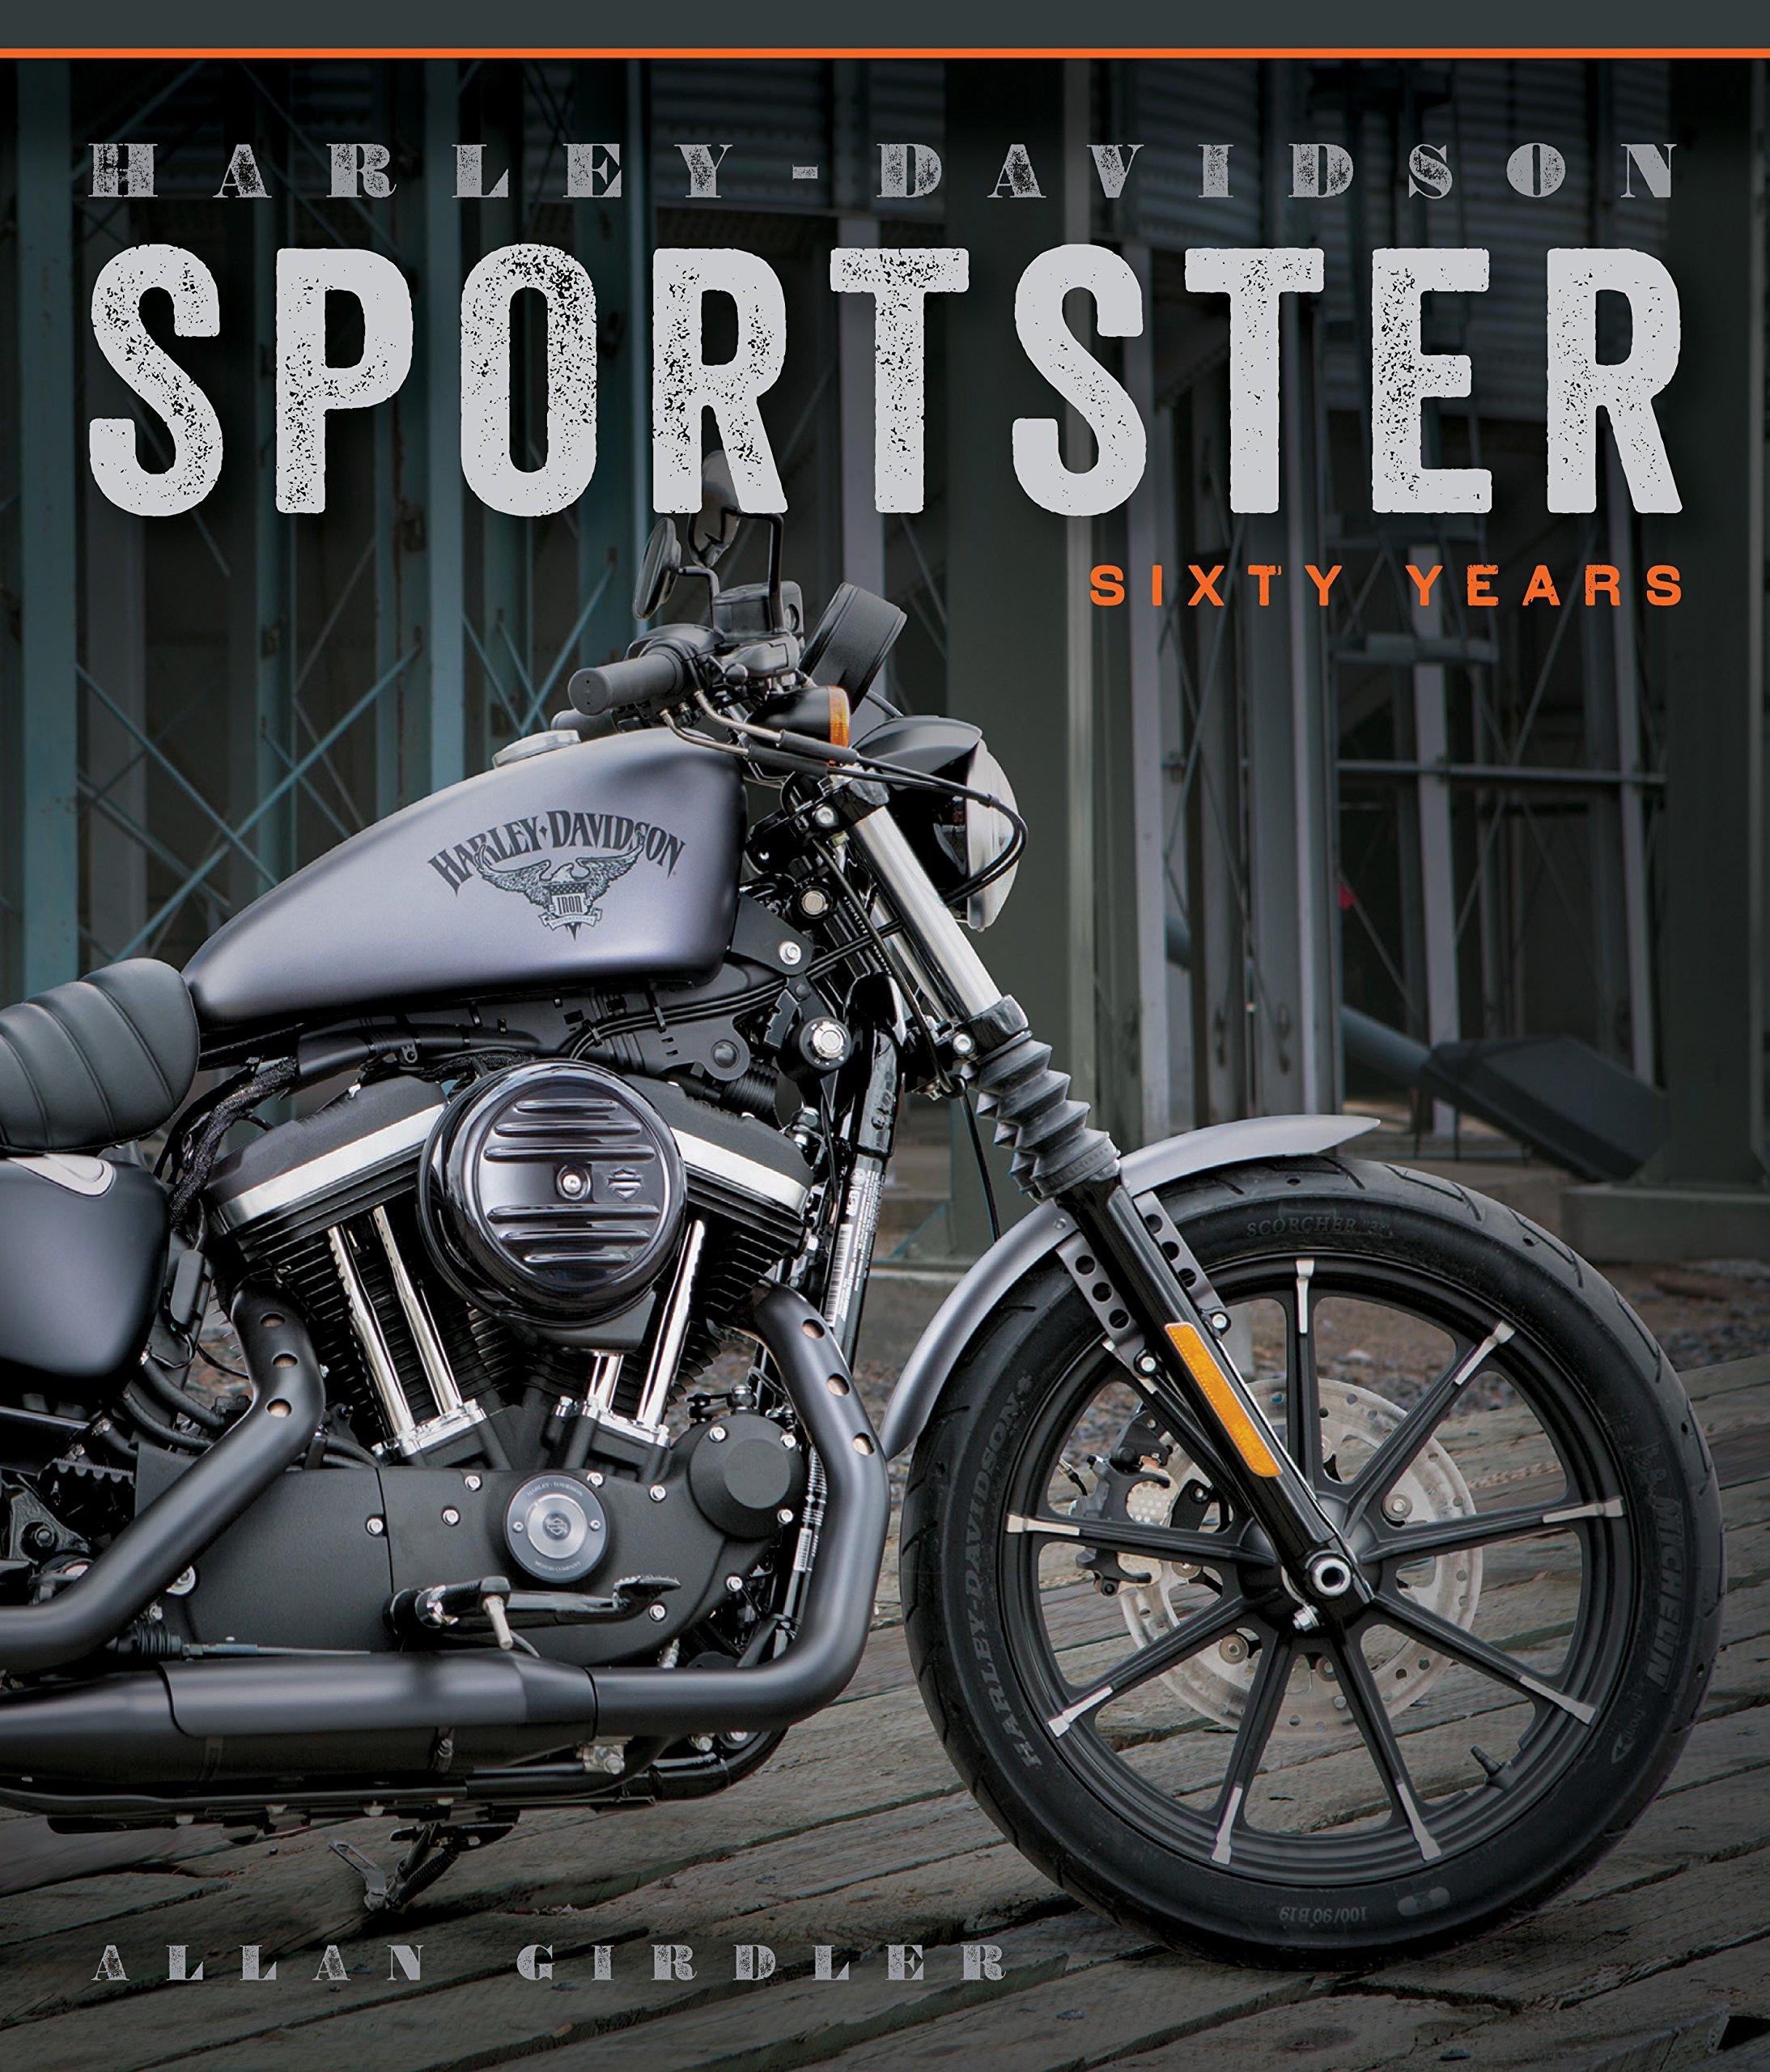 harley-davidson-sportster-sixty-years